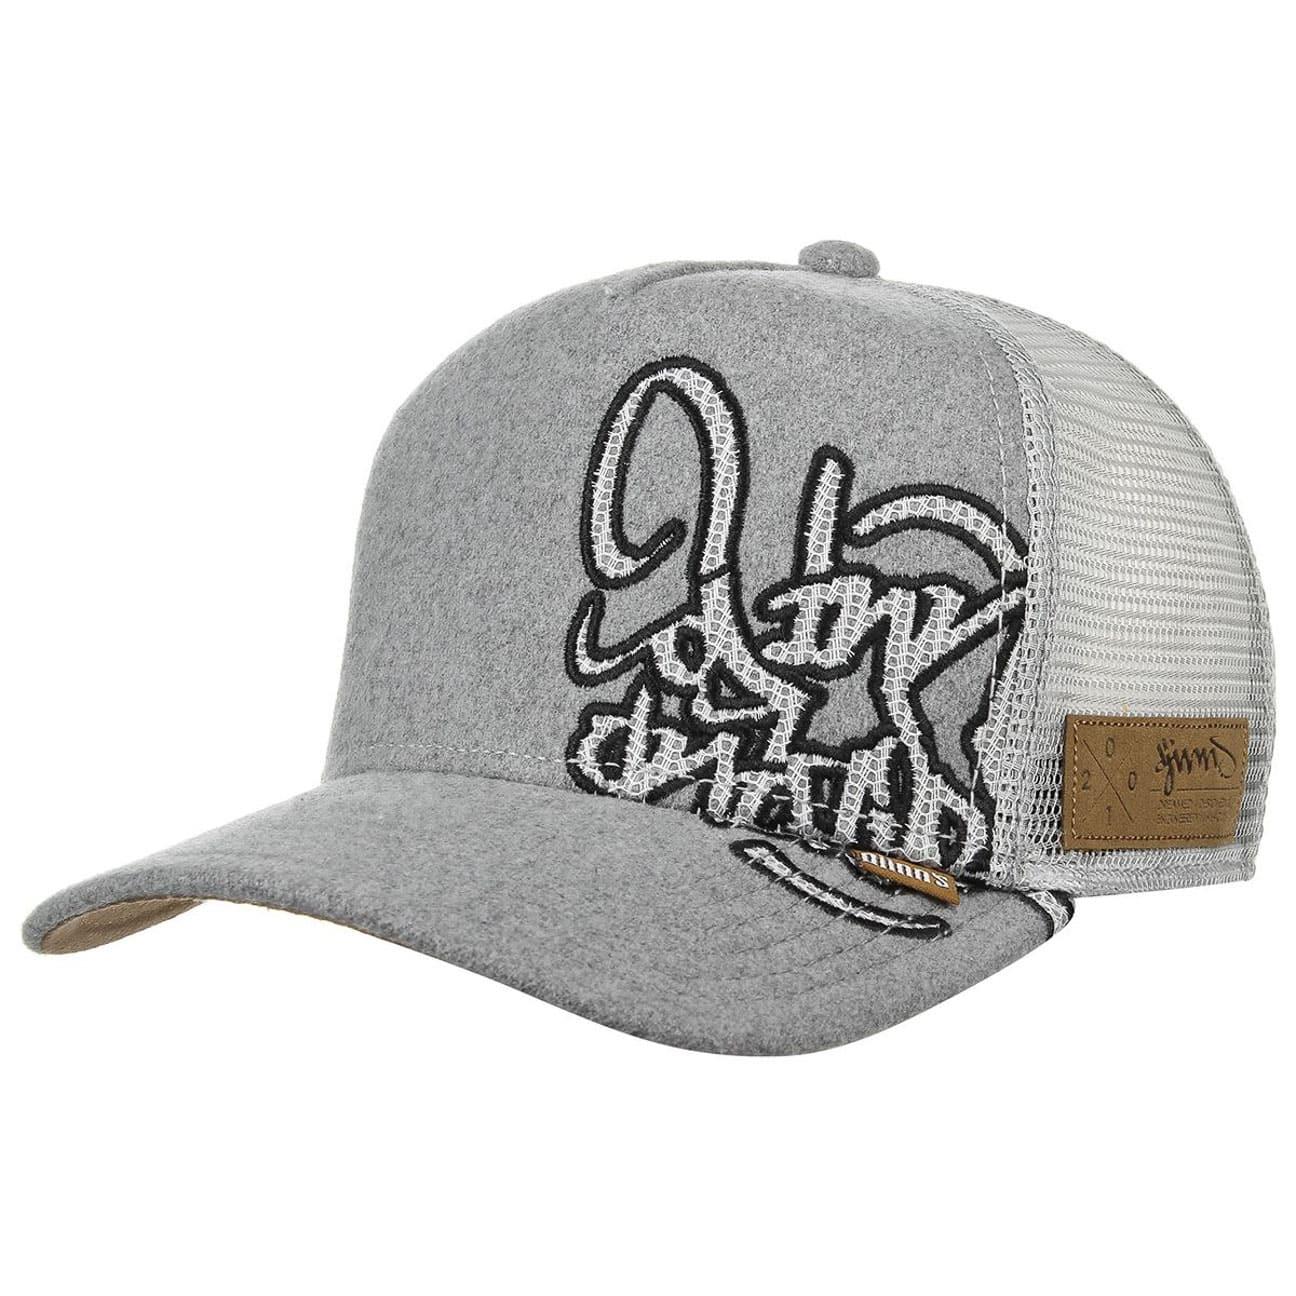 felt mesh trucker cap by djinns eur 19 99 hats caps. Black Bedroom Furniture Sets. Home Design Ideas